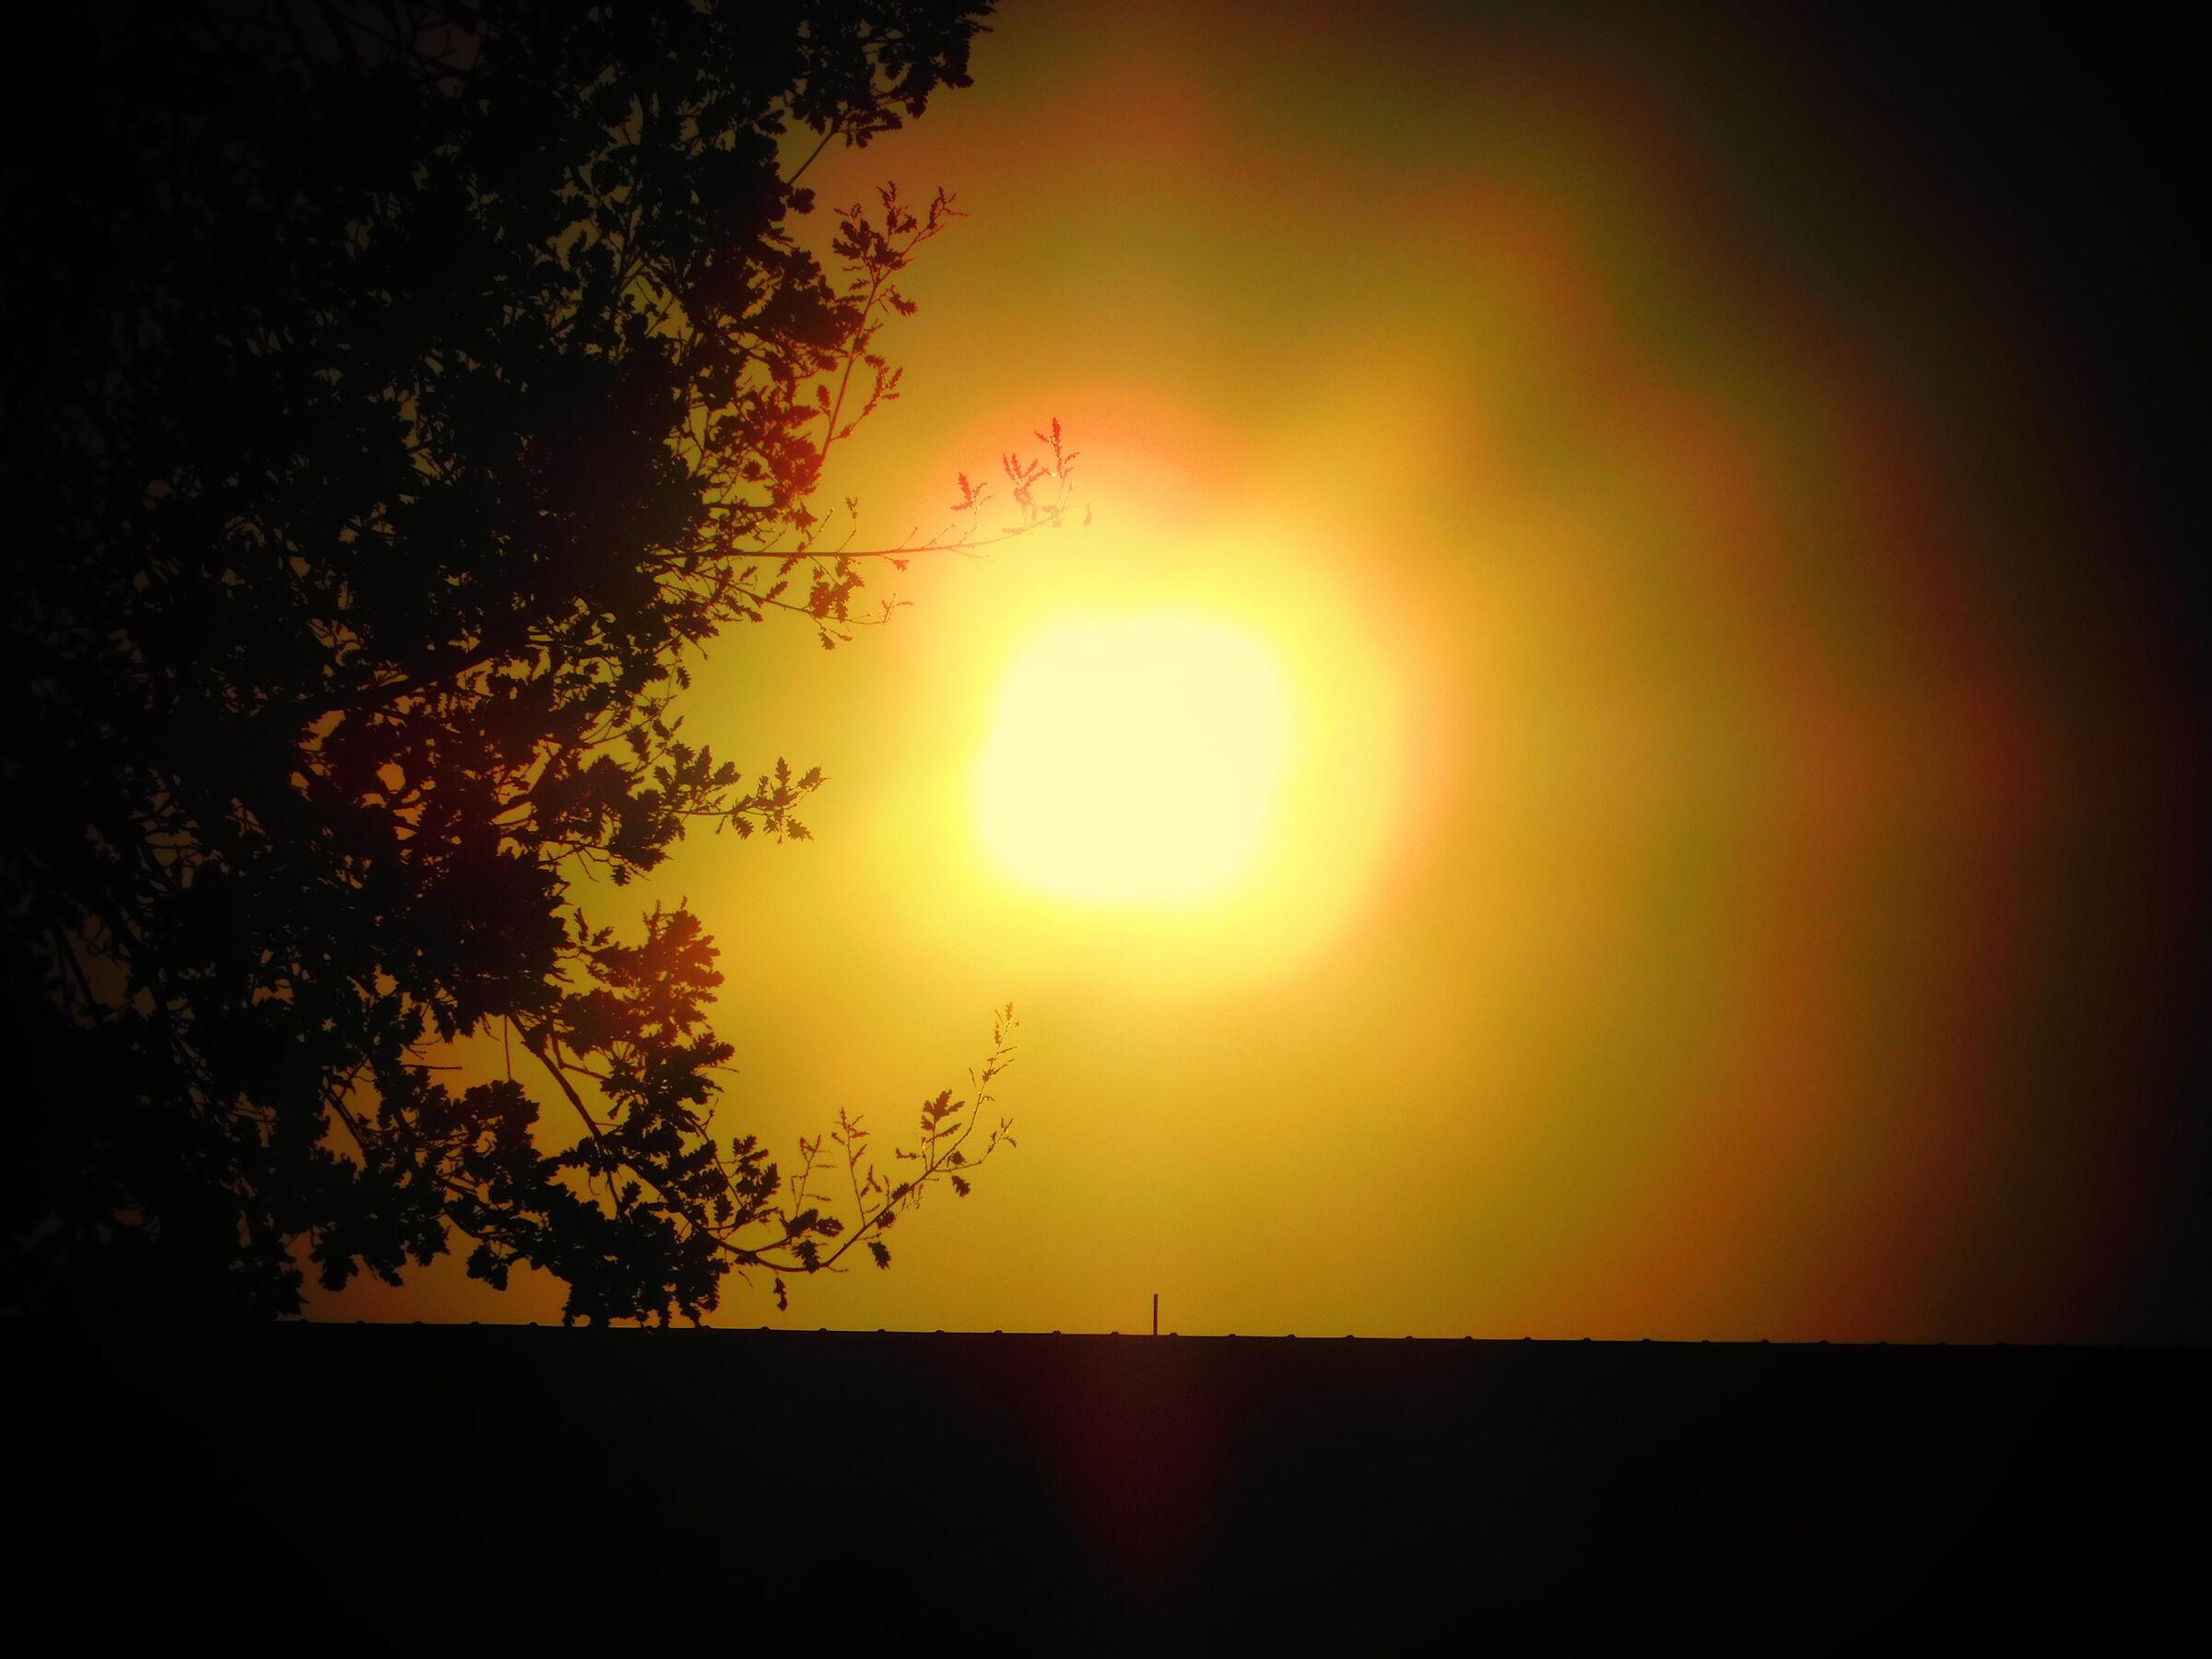 Details at sunset...